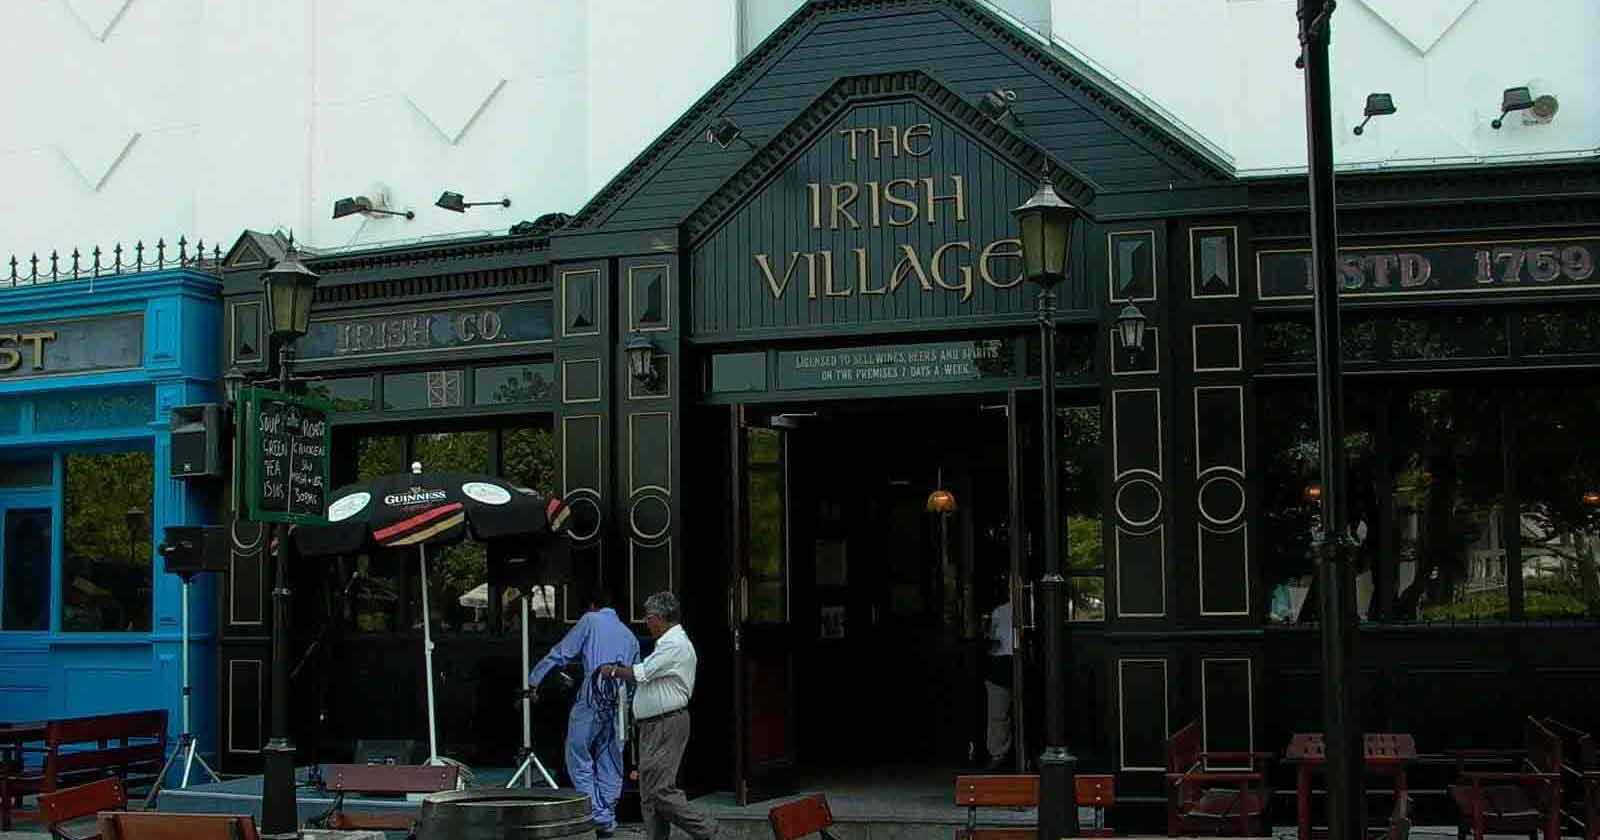 The Irish Village in Dubai